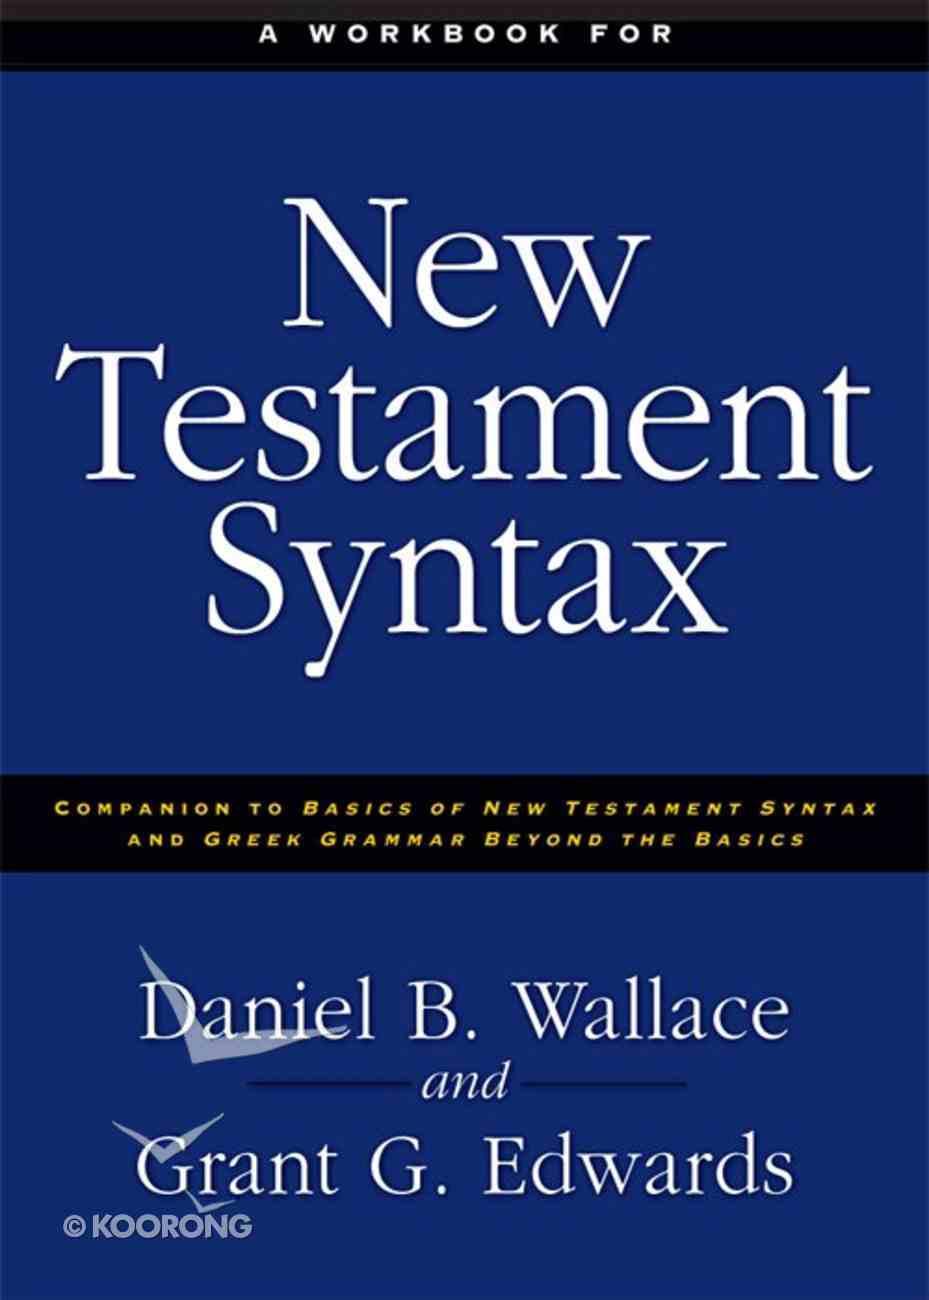 A Workbook For New Testament Syntax eBook